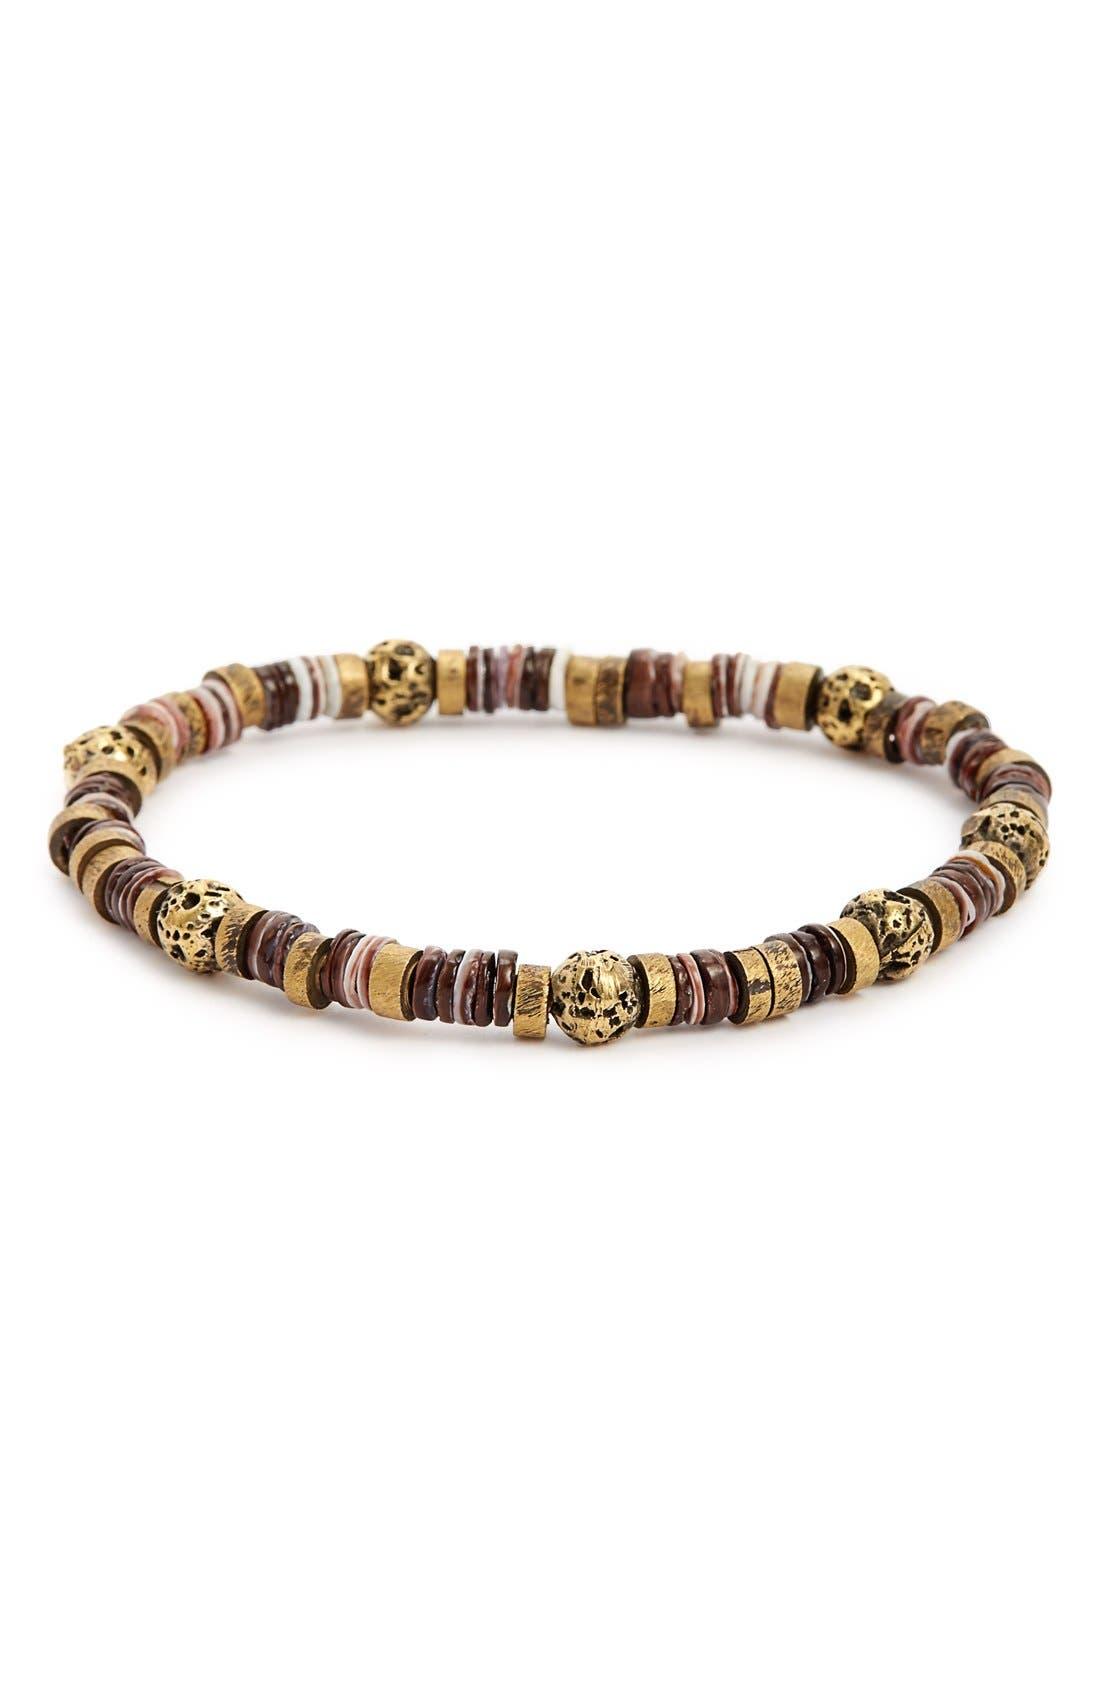 Lava Rock & Brass Bead Bracelet,                             Main thumbnail 1, color,                             200